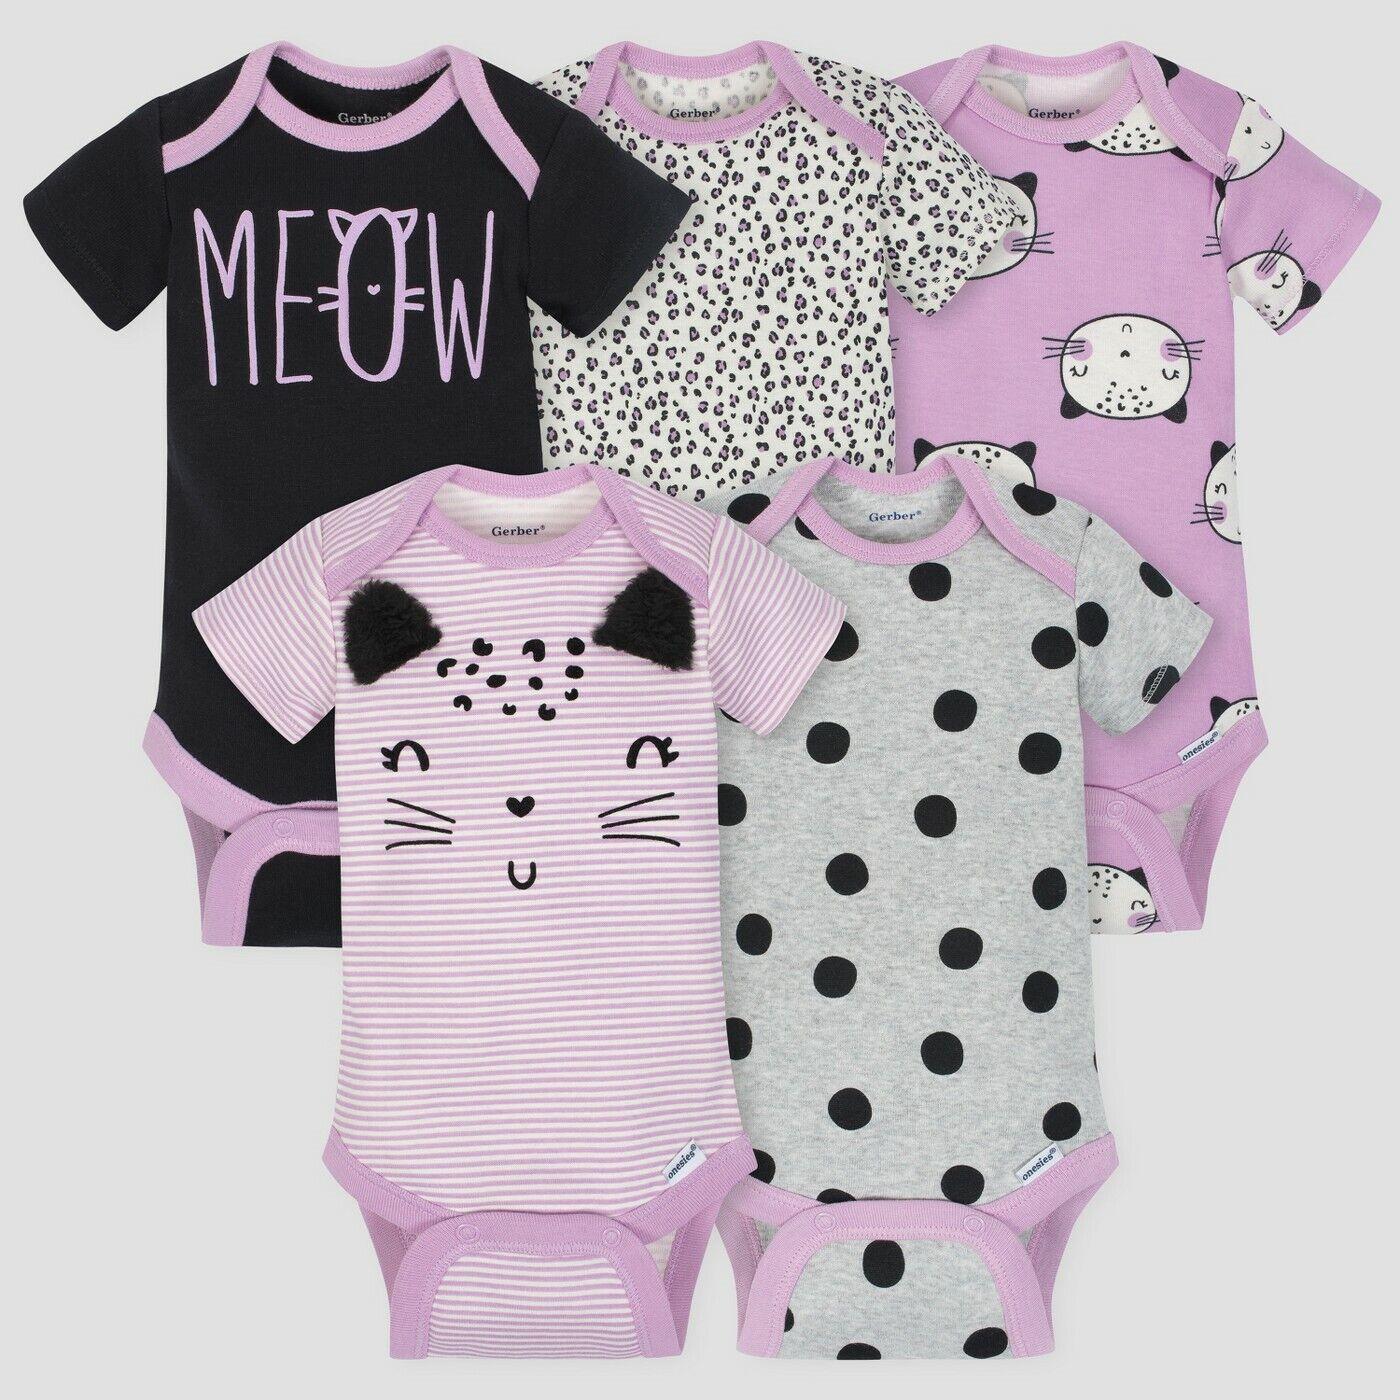 Gerber Baby Girl's 5 Pack Short Sleeve Onesies Size 6-9 Mont